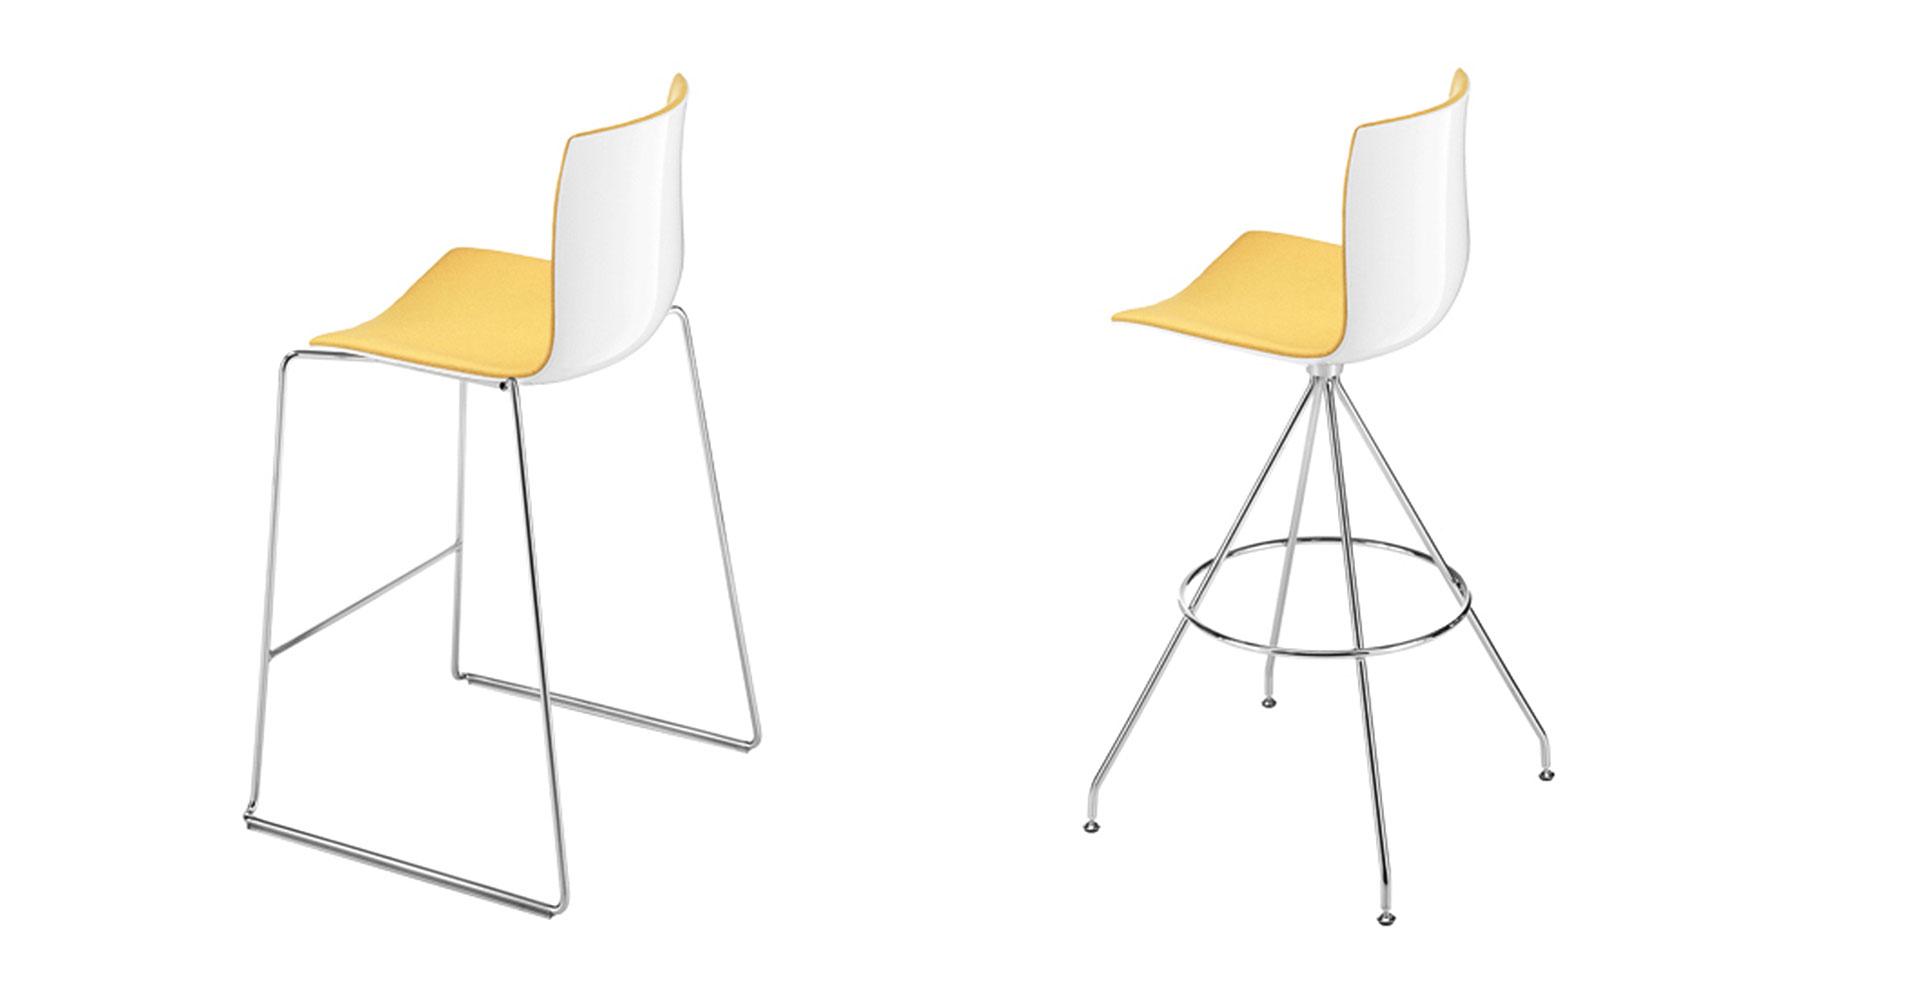 catifa 46 arper stool catifa 46 arper. Black Bedroom Furniture Sets. Home Design Ideas